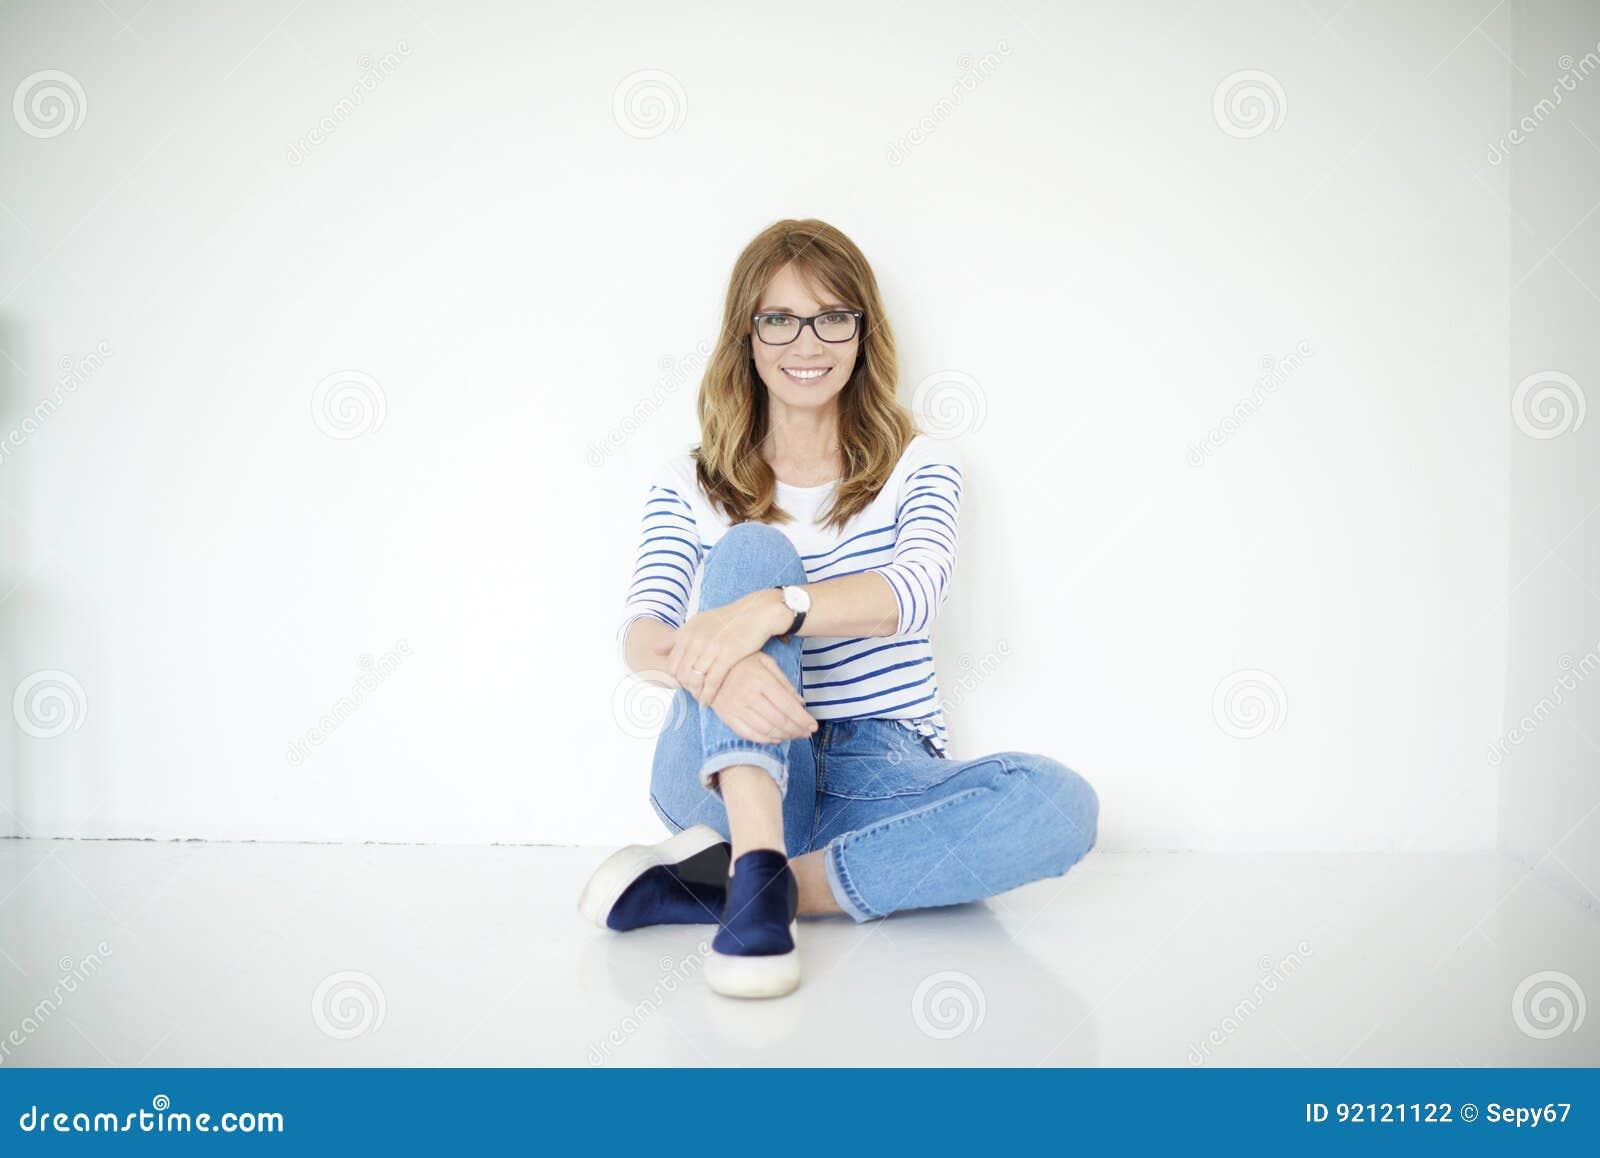 Retrato confidente de la mujer